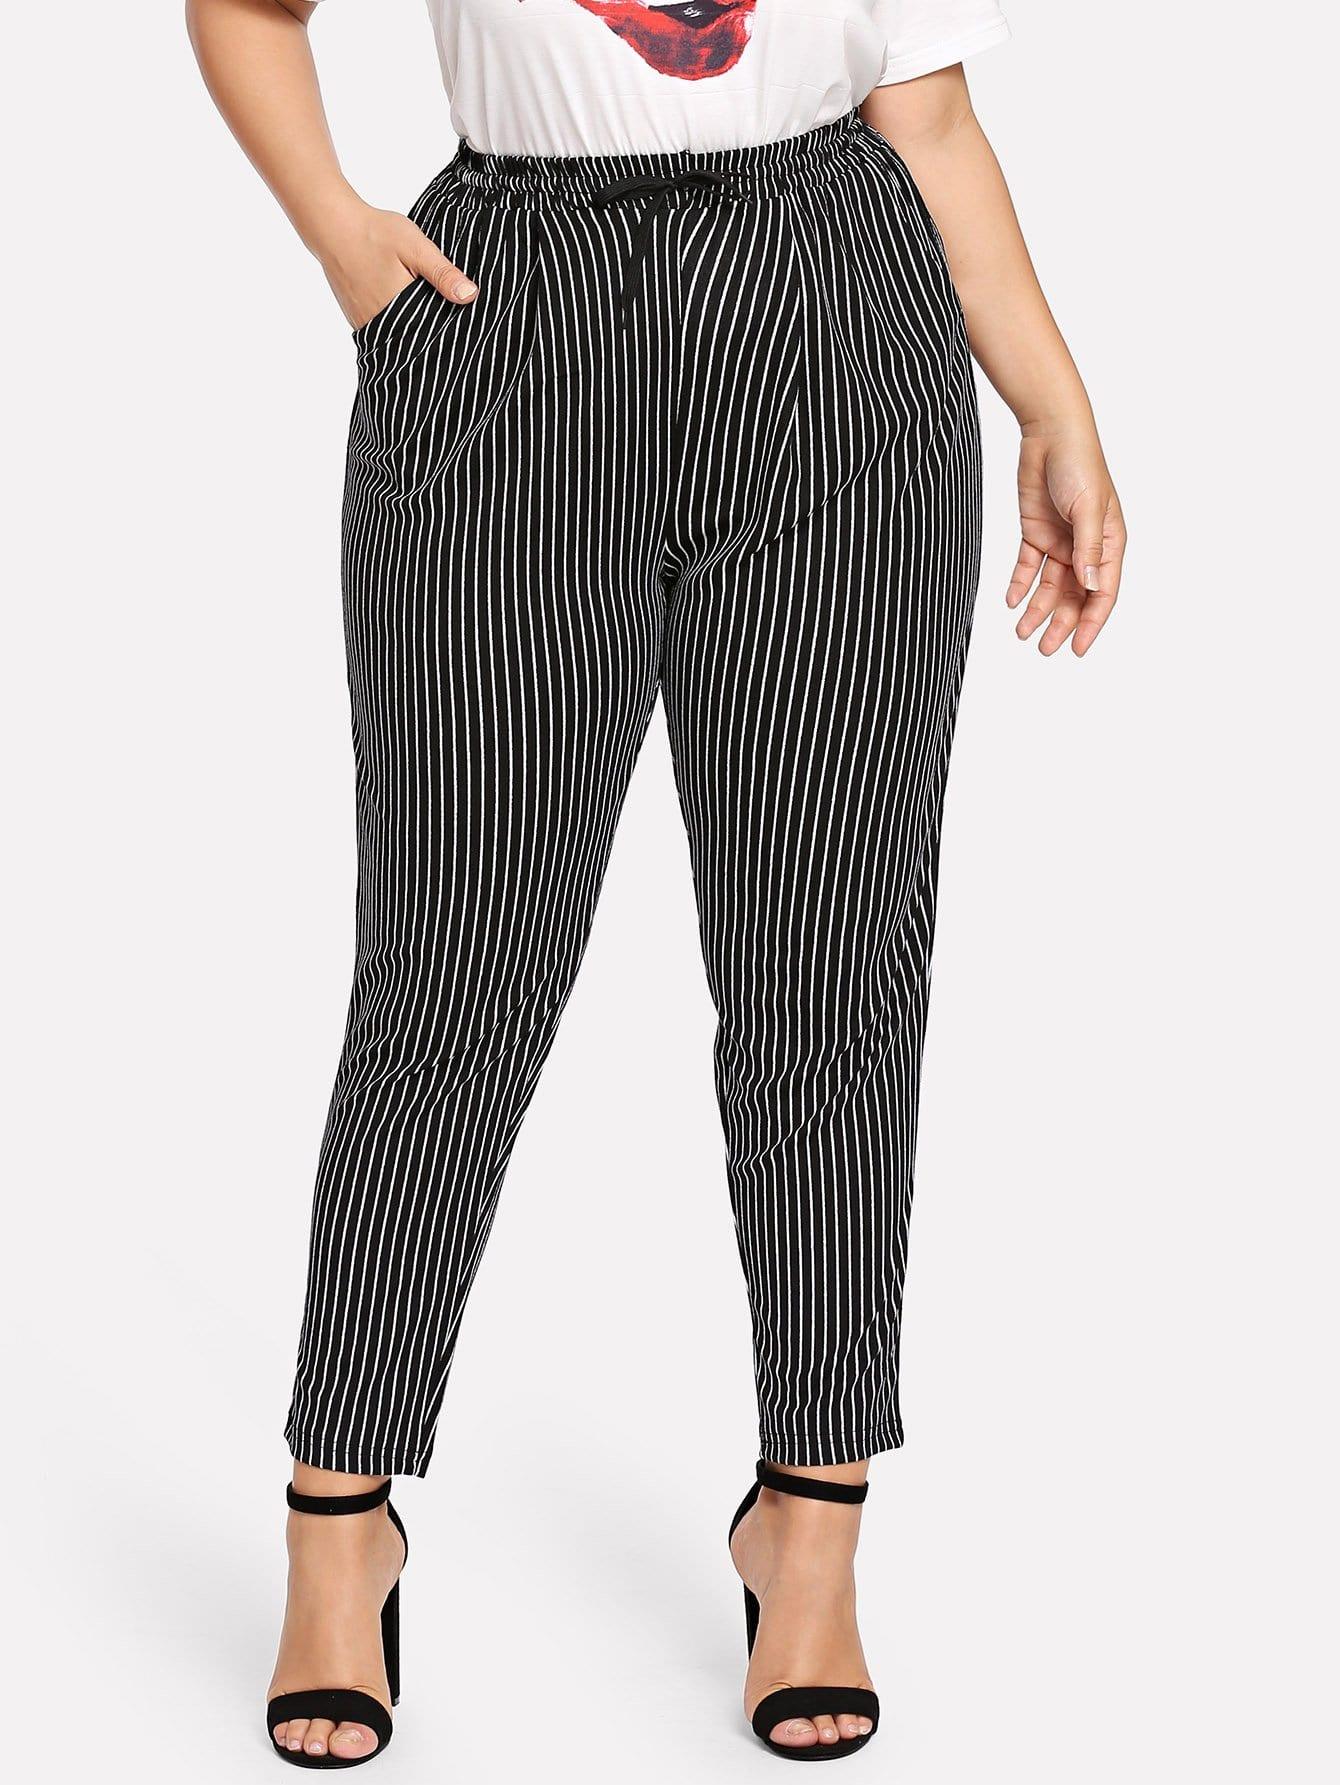 Plus Striped Drawstring Pocket Pants